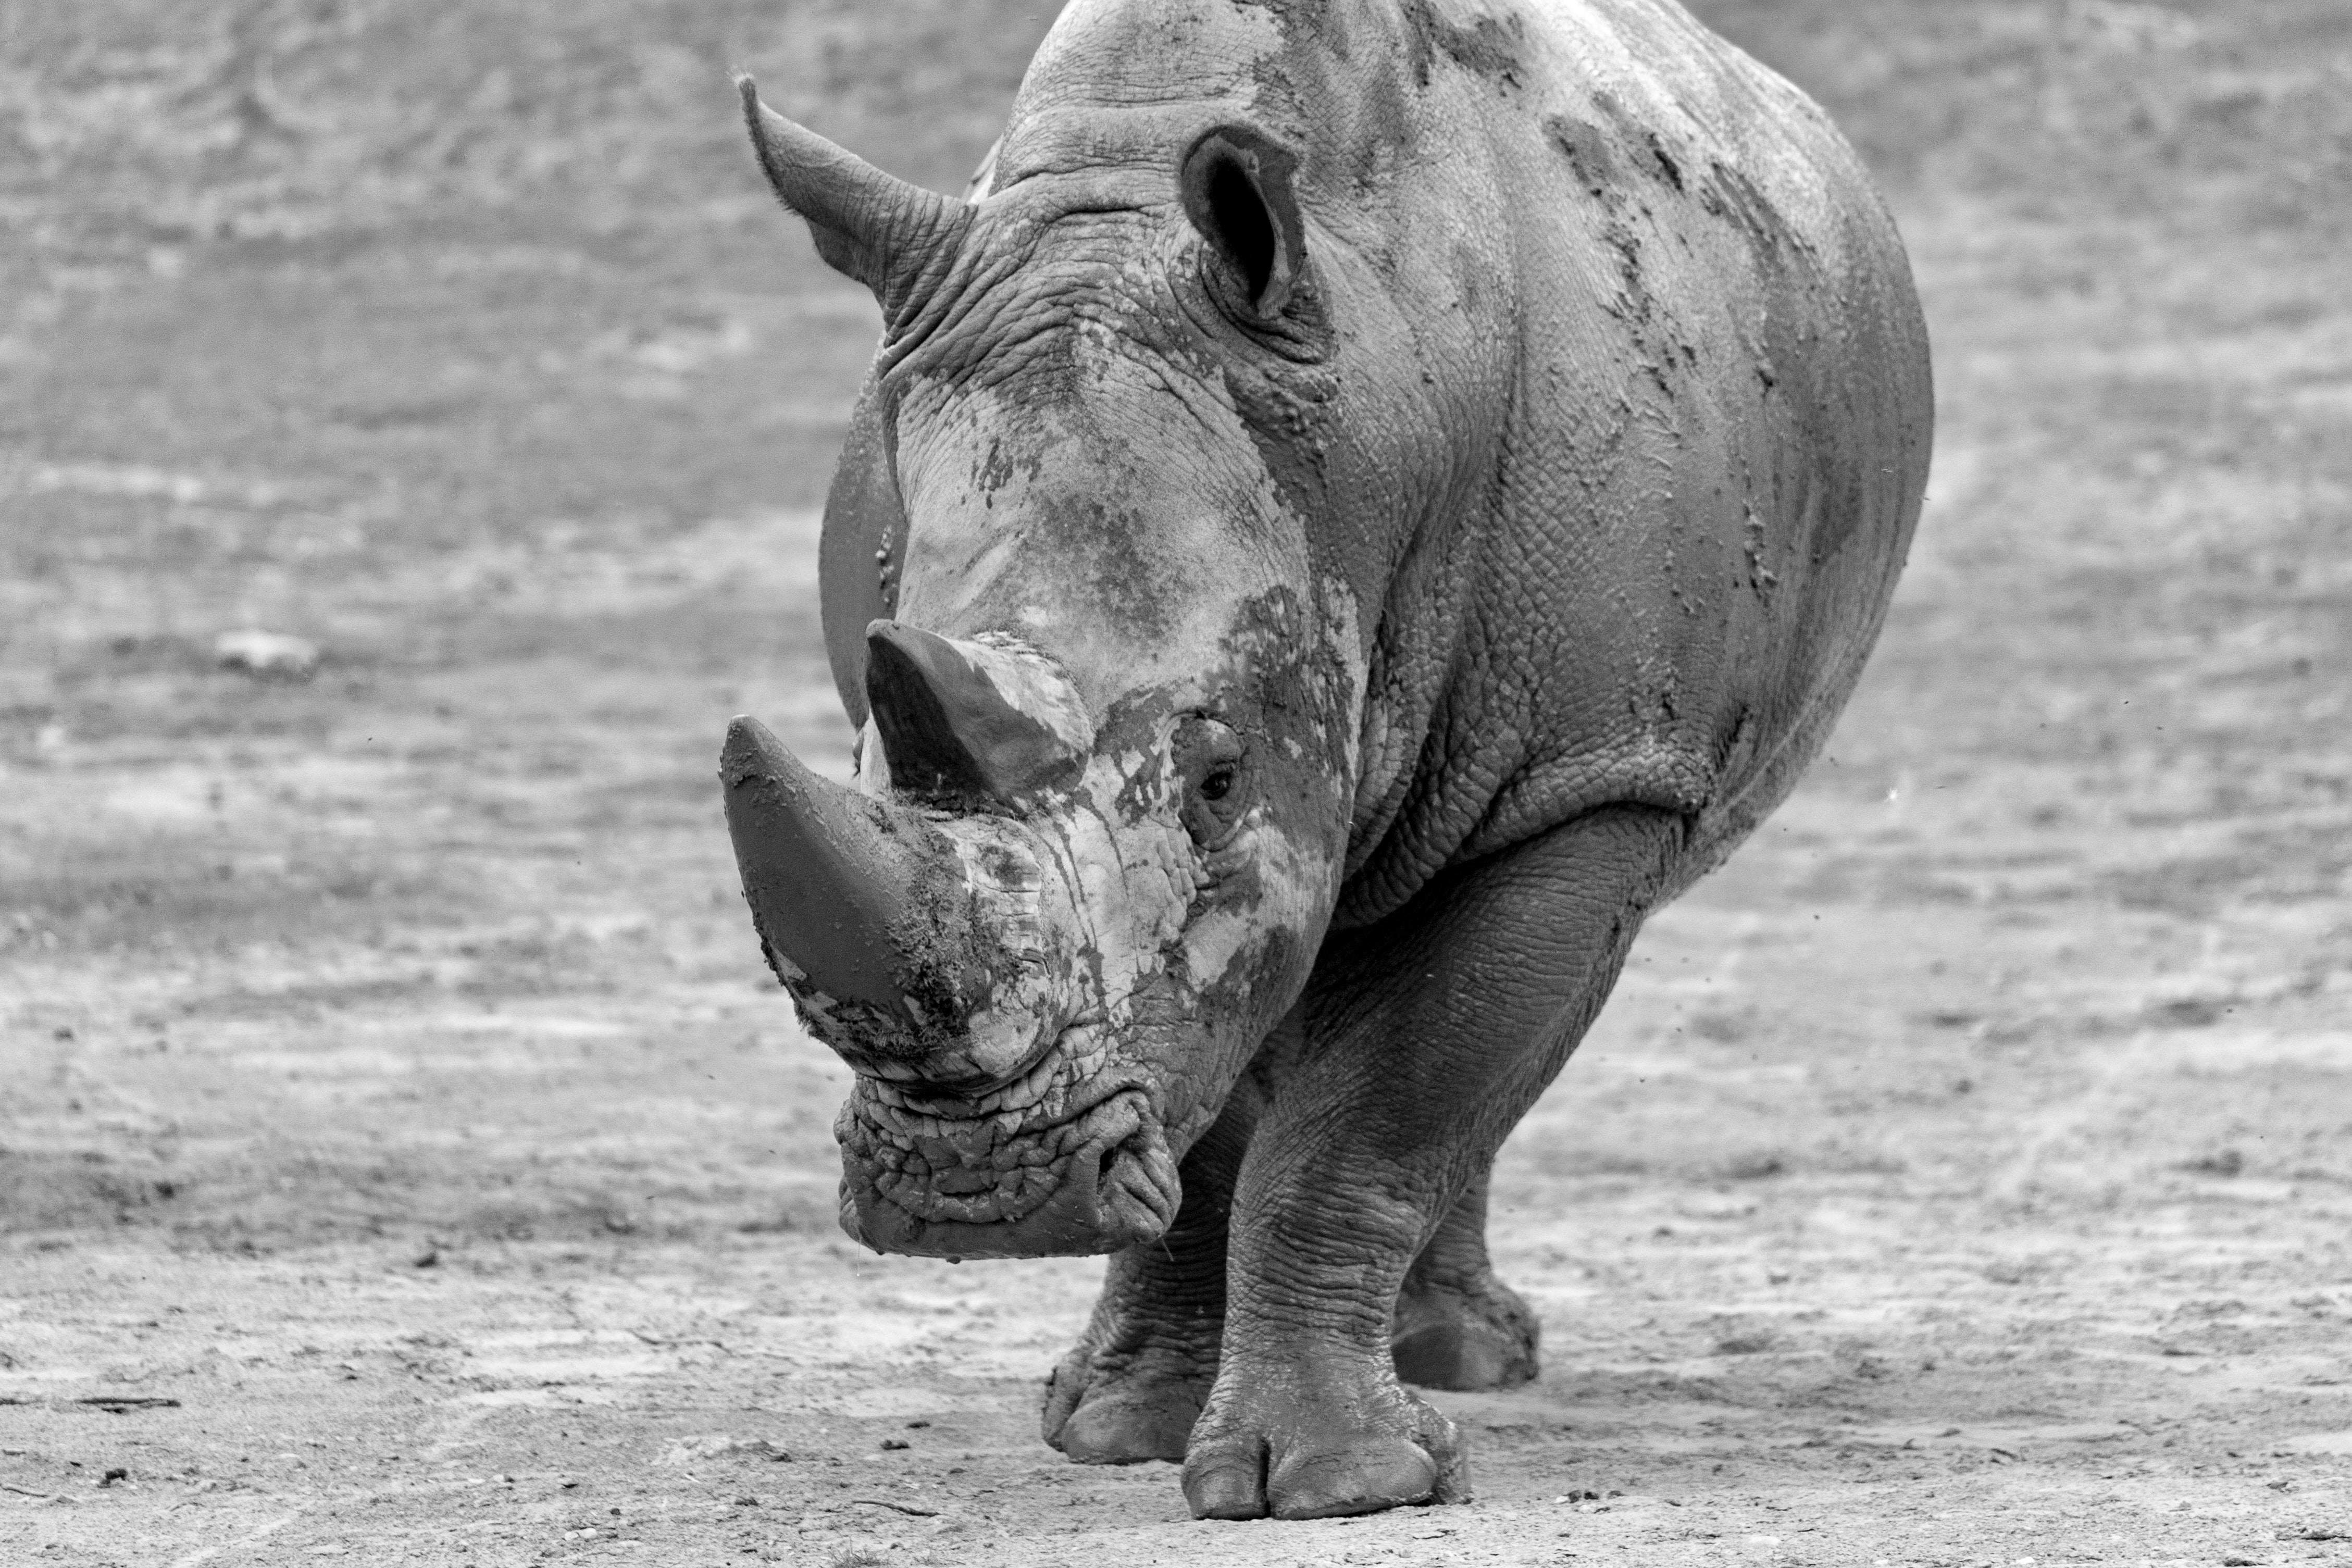 grayscale photography of rhinoceros